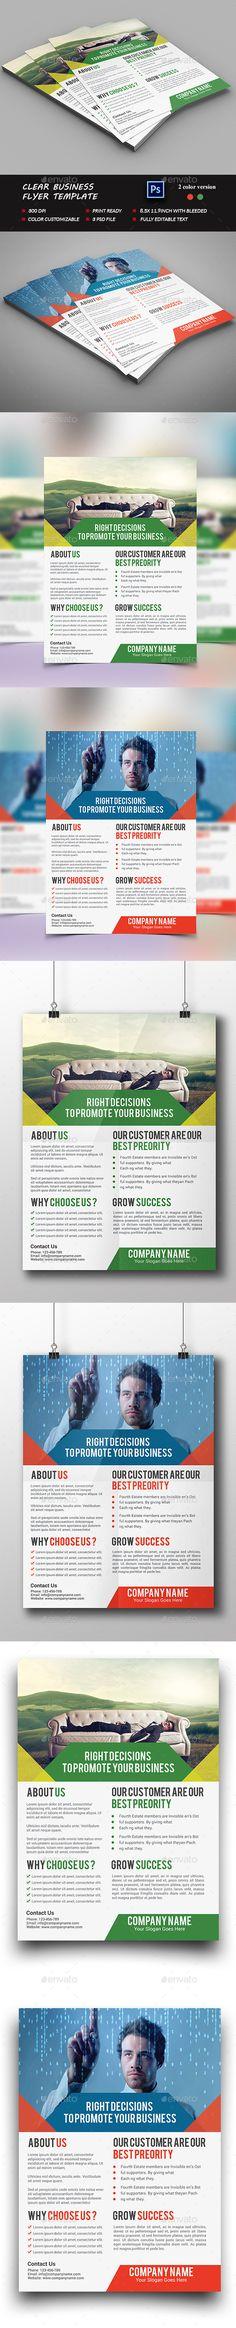 Clean Business Flyer Tempalte #design Download: http://graphicriver.net/item/clean-business-flyer-template/12499455?ref=ksioks